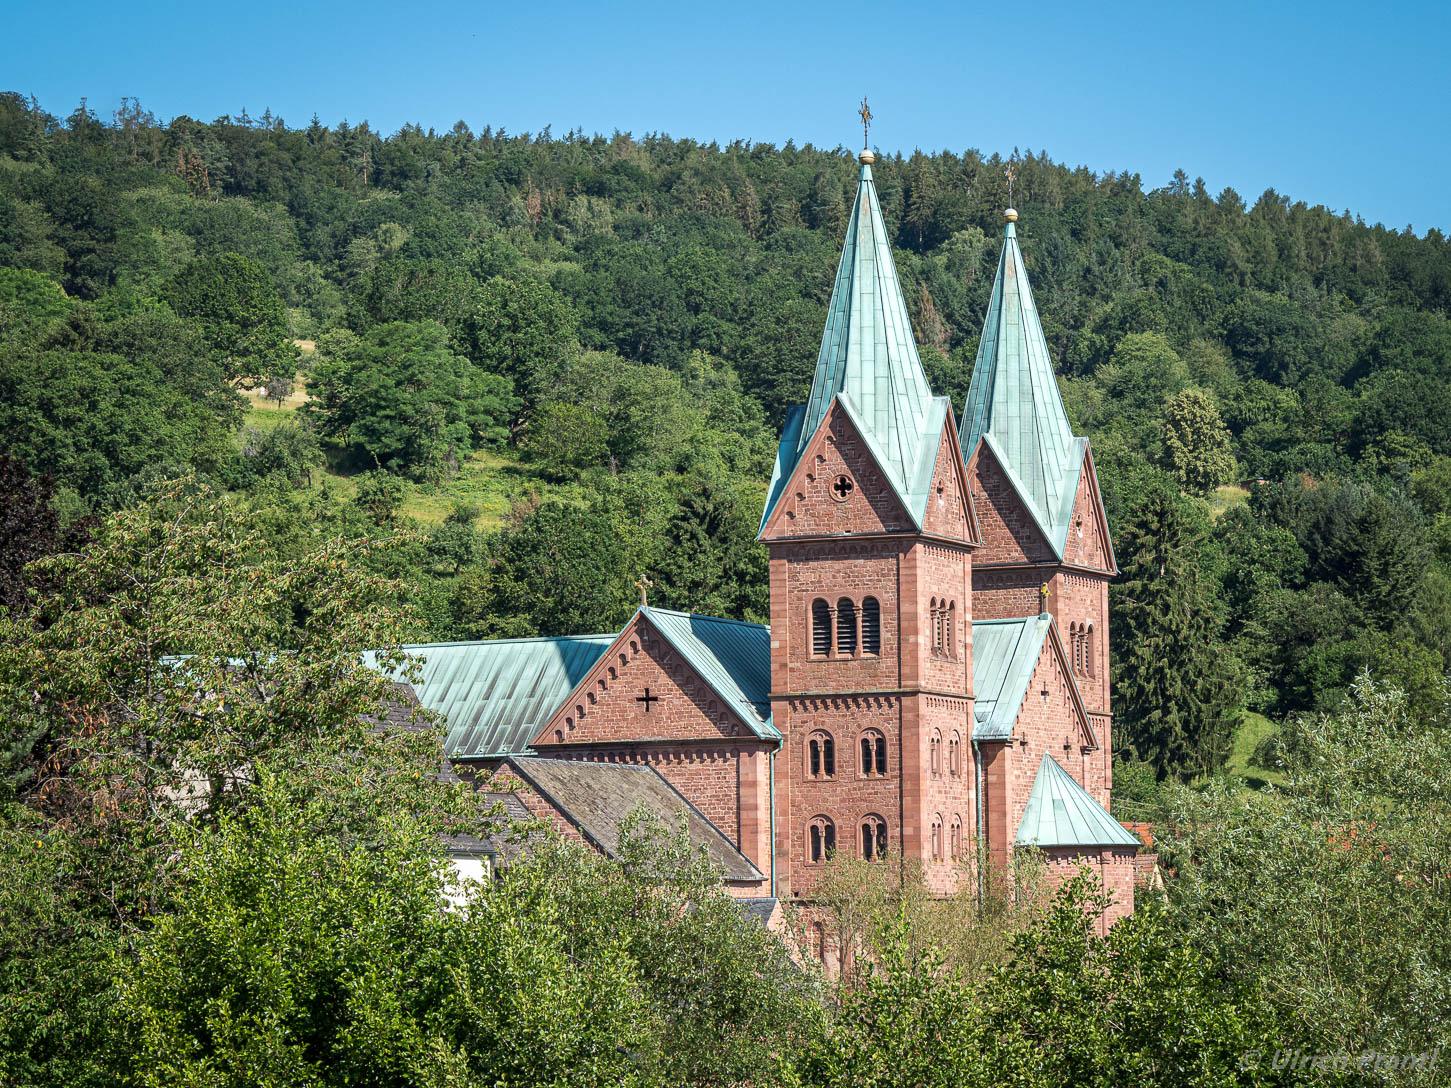 Kloster Neustadt